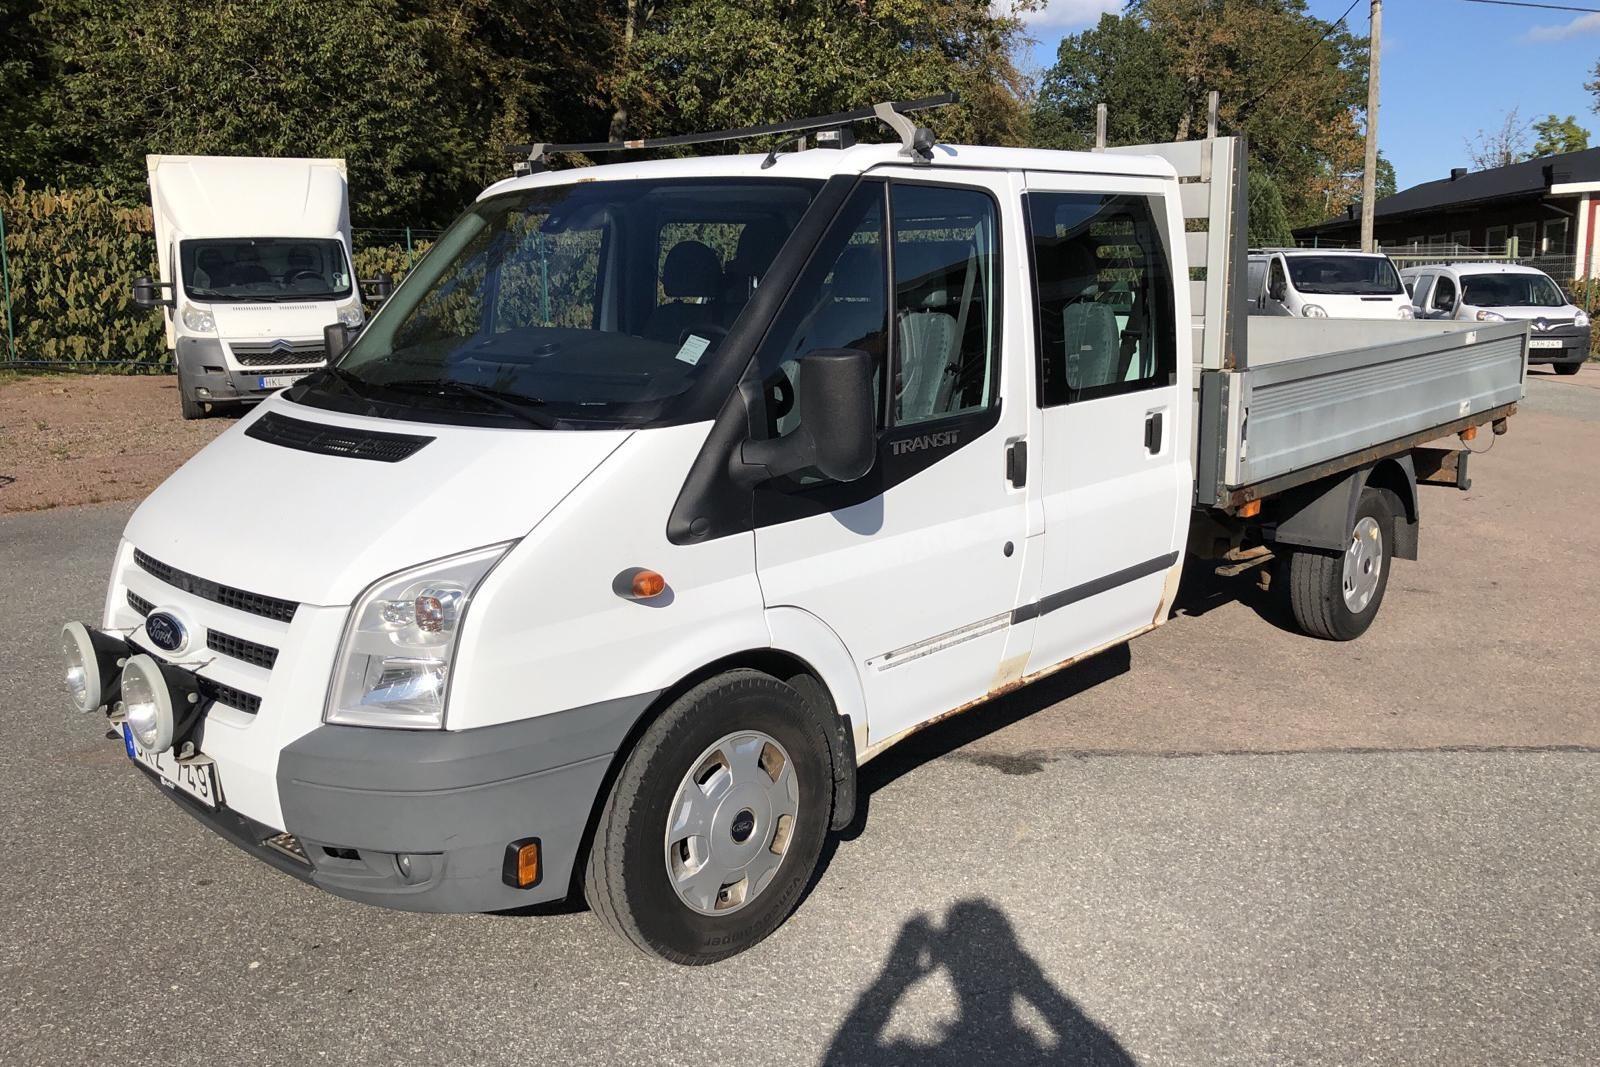 Ford Transit 350 2.4 TDCi Abholung (140hk)